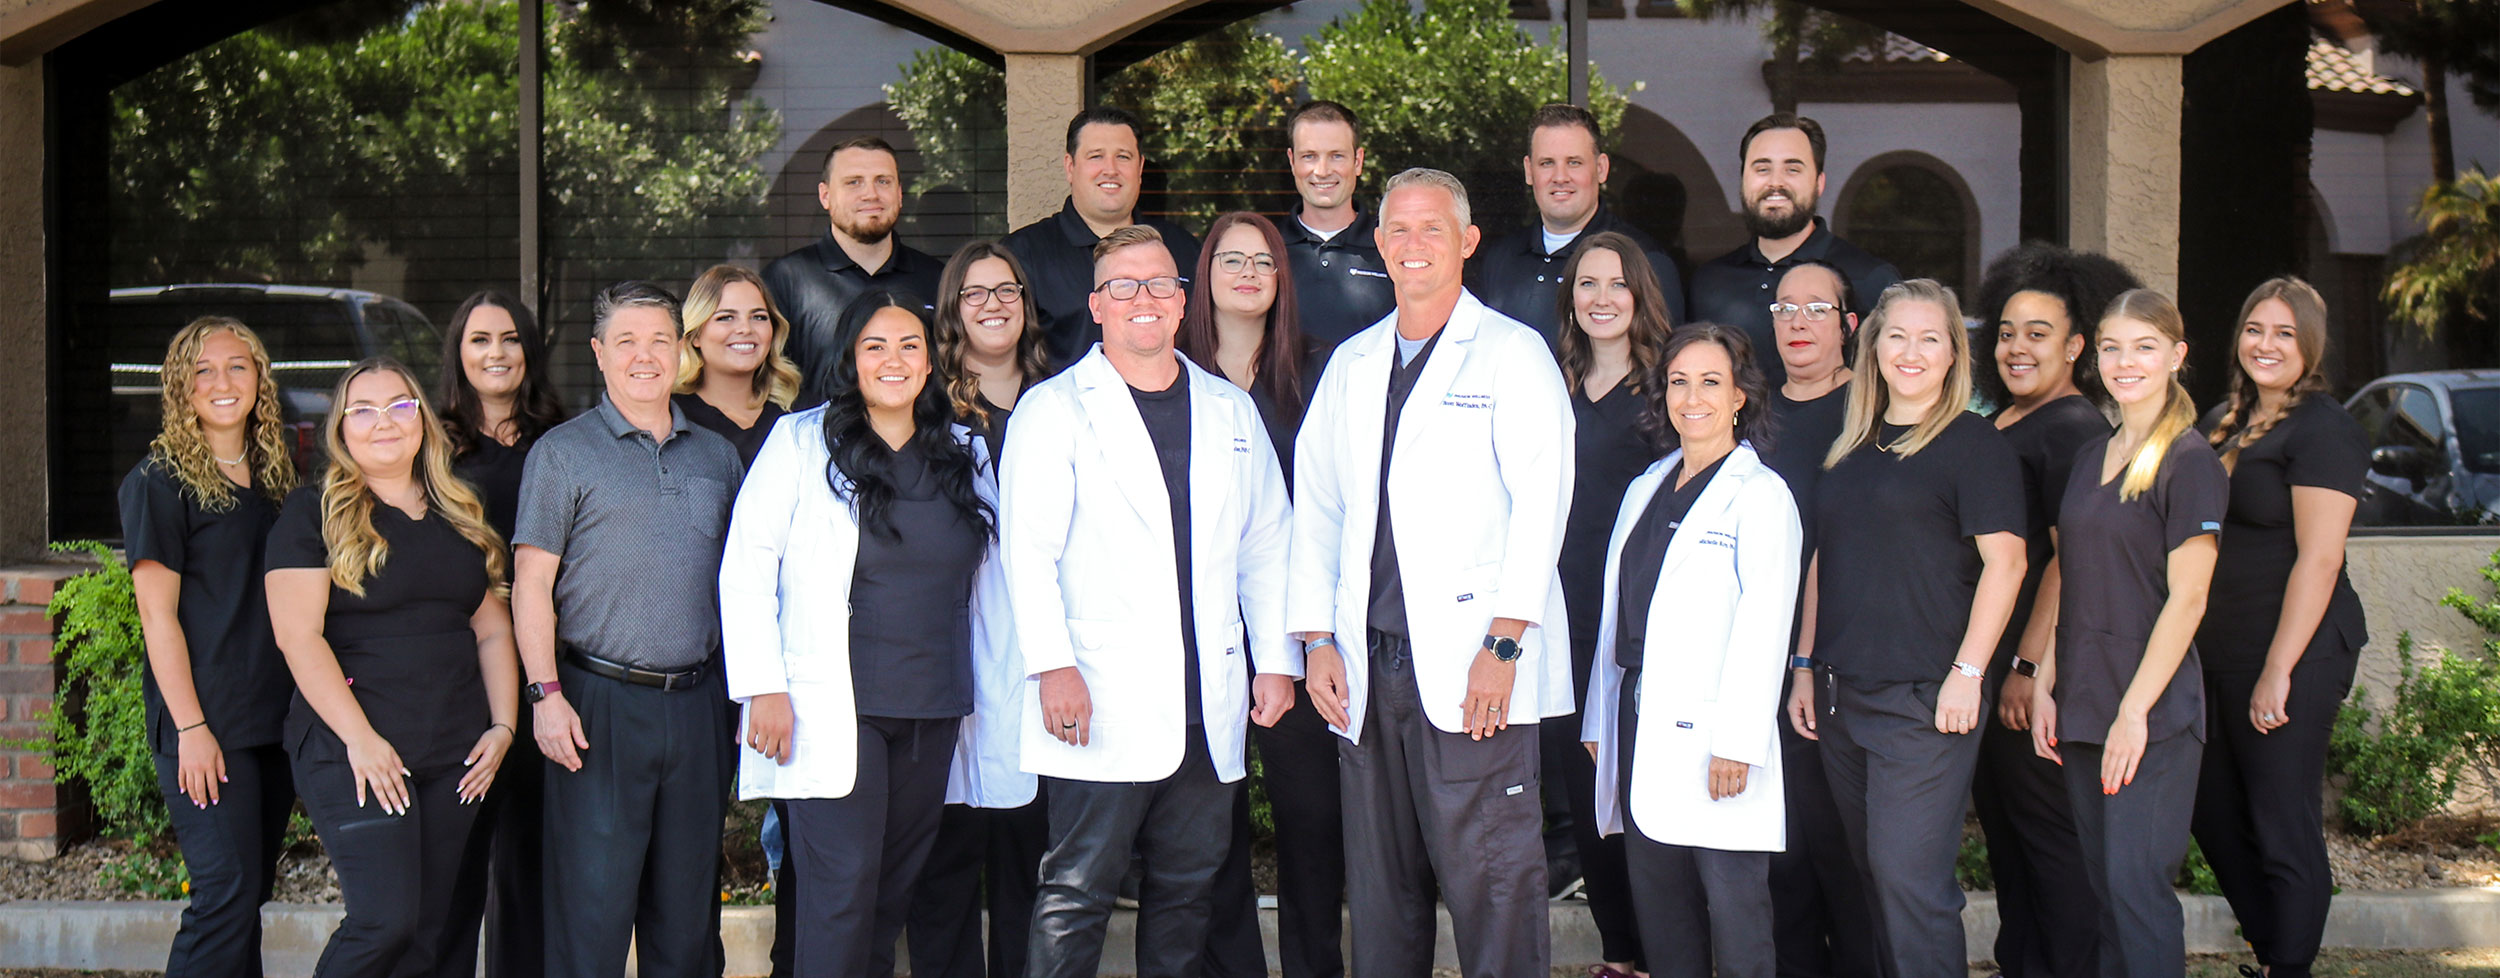 Phusion Wellness team photo